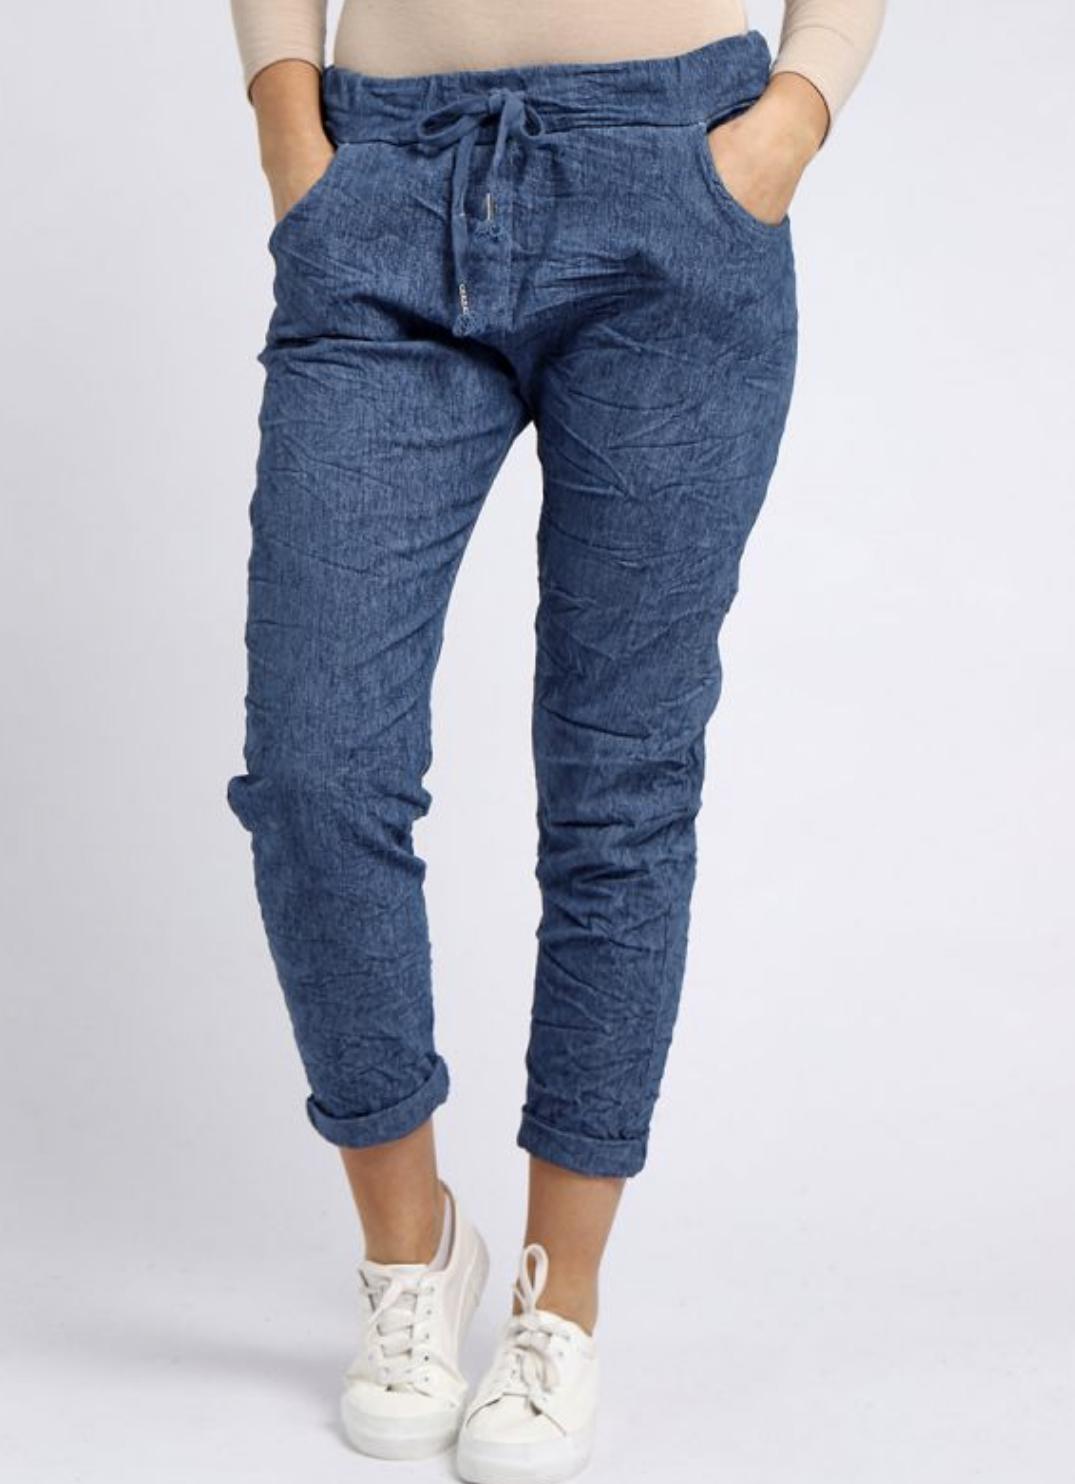 6002 Italian Ladies Plain Magic Pants